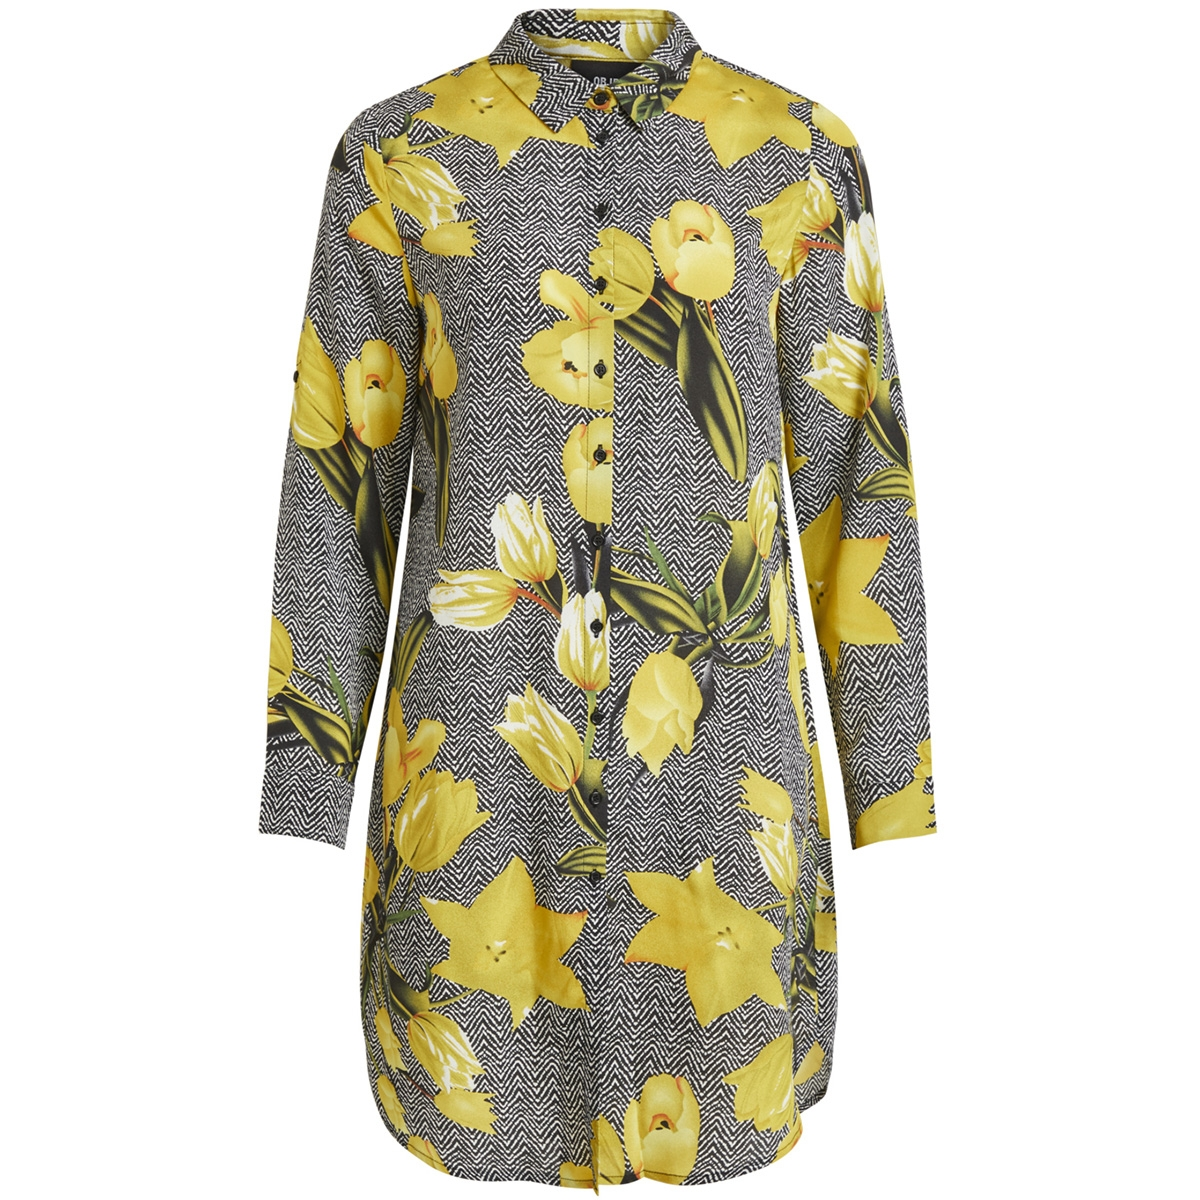 objmari l/s casey shirt 101 23029043 object blouse black/graphic w.